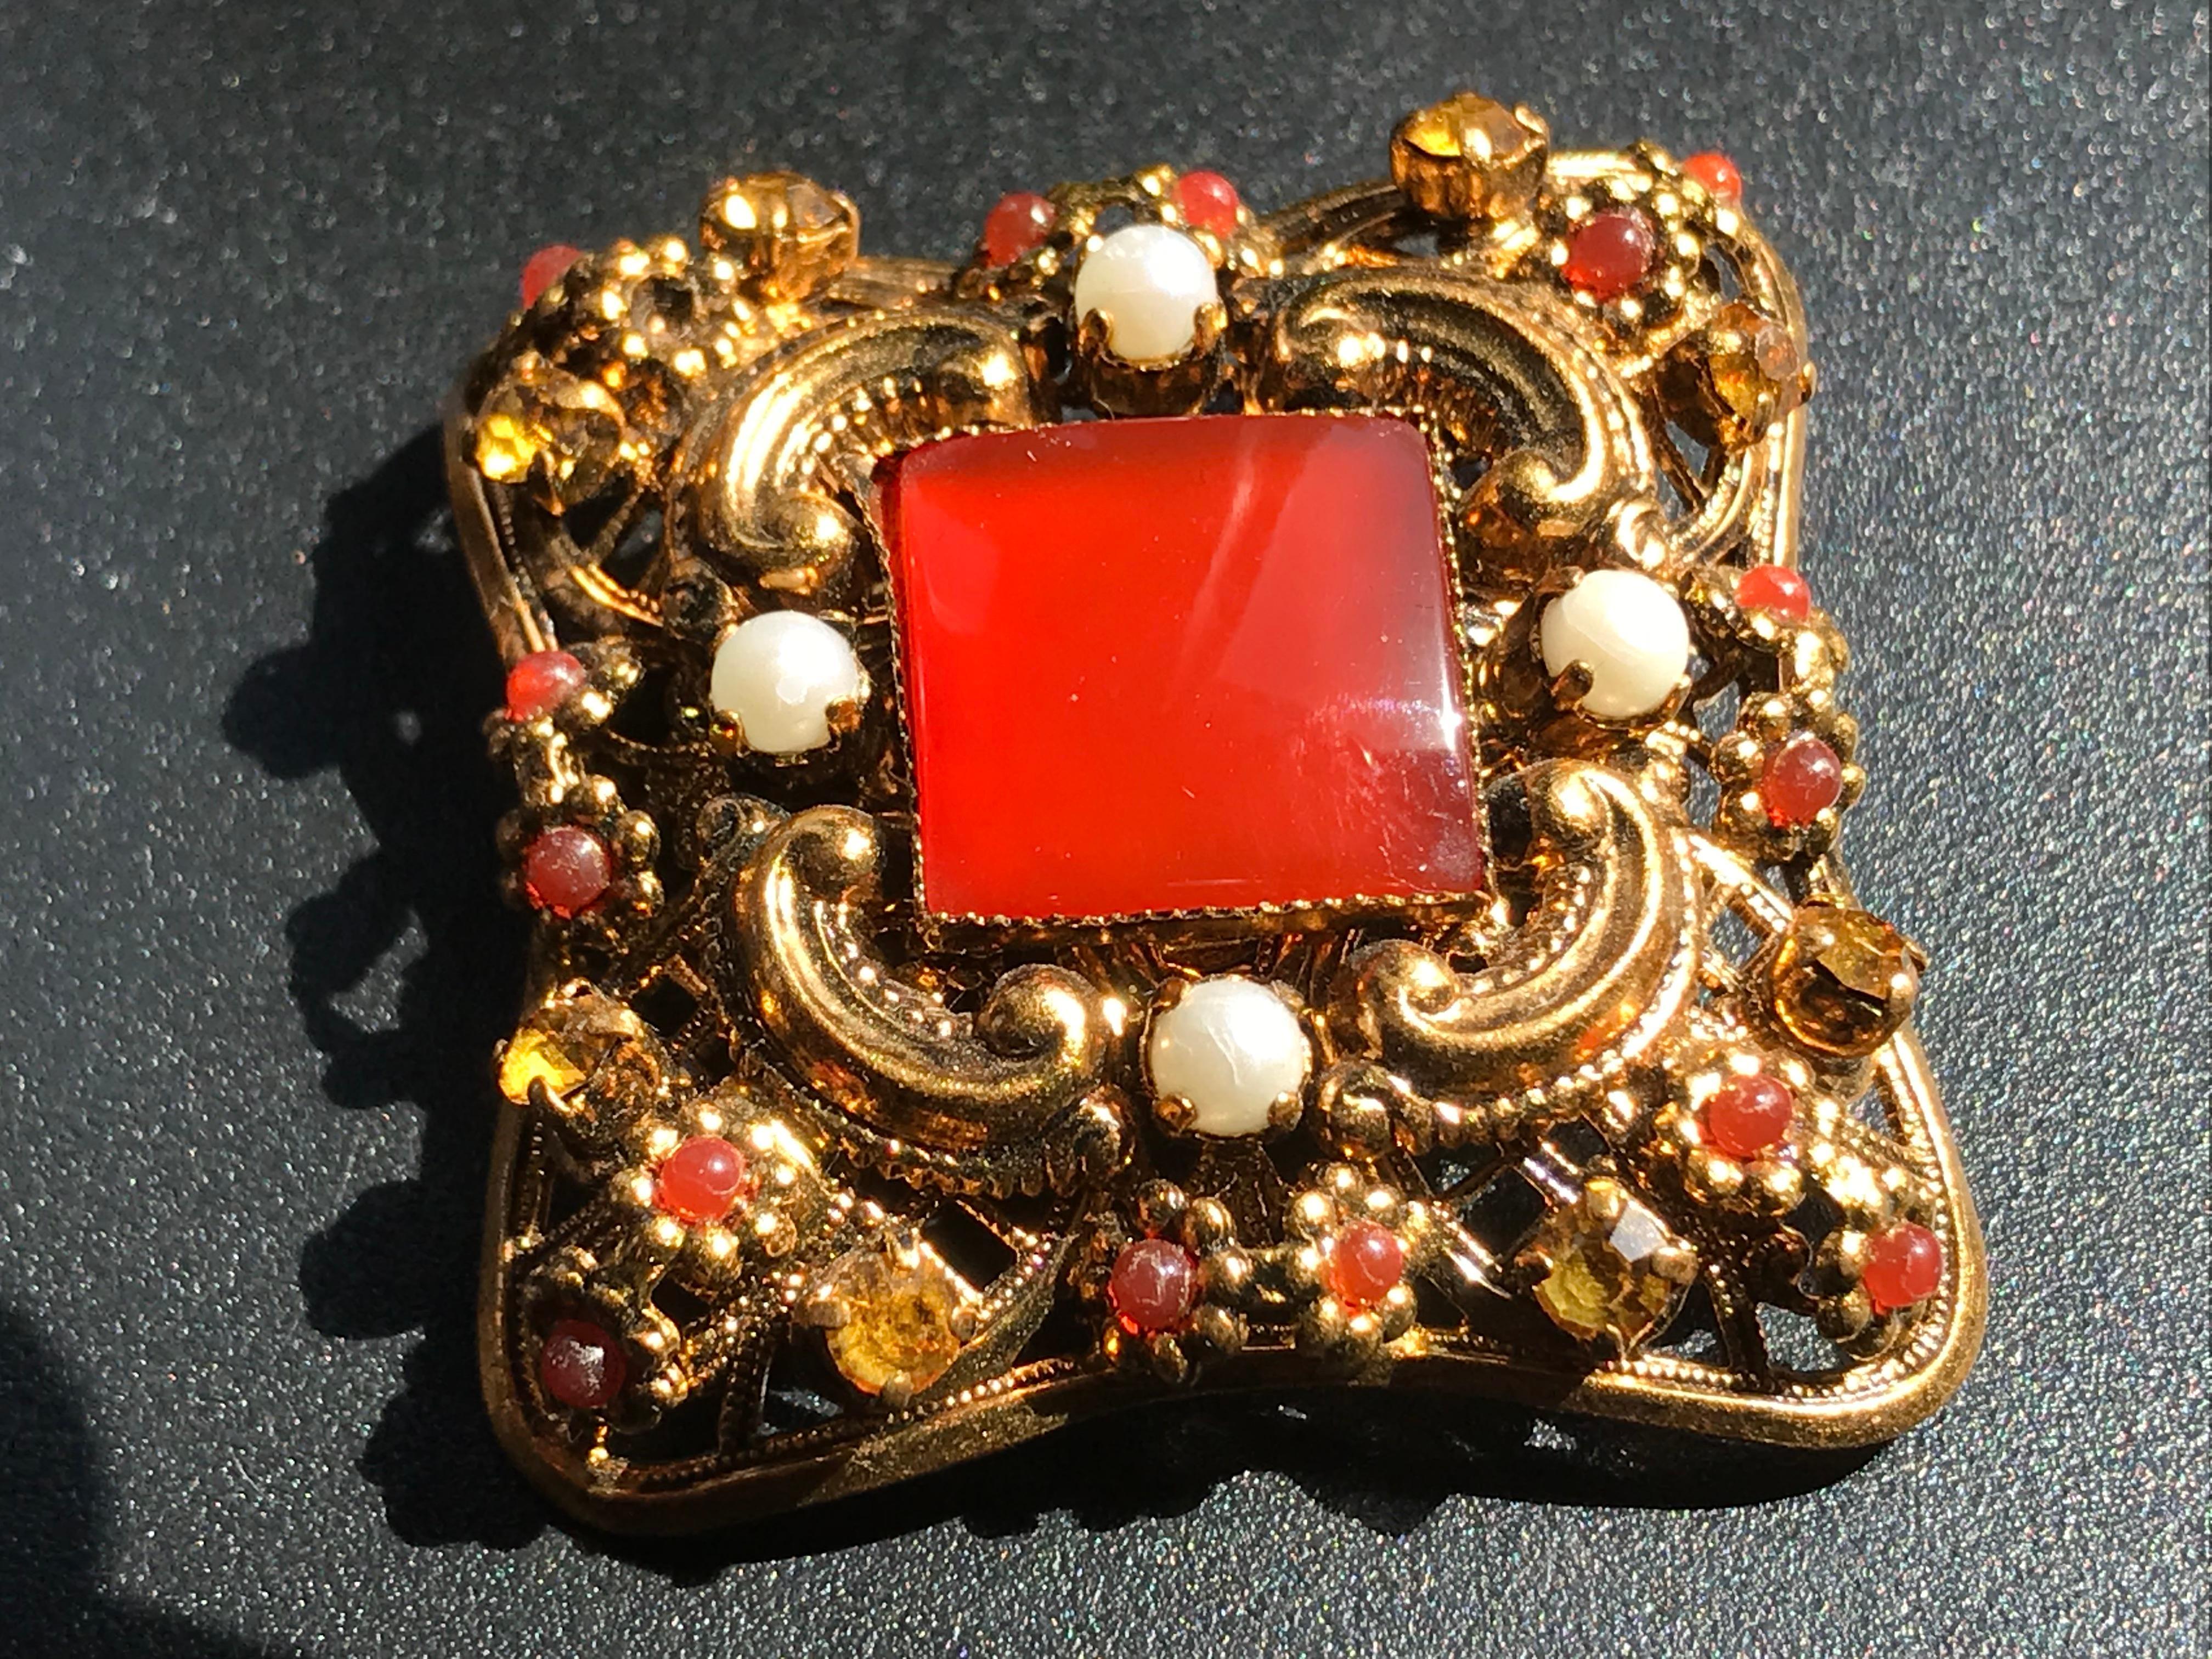 Vintage West Germany Brooch Pin